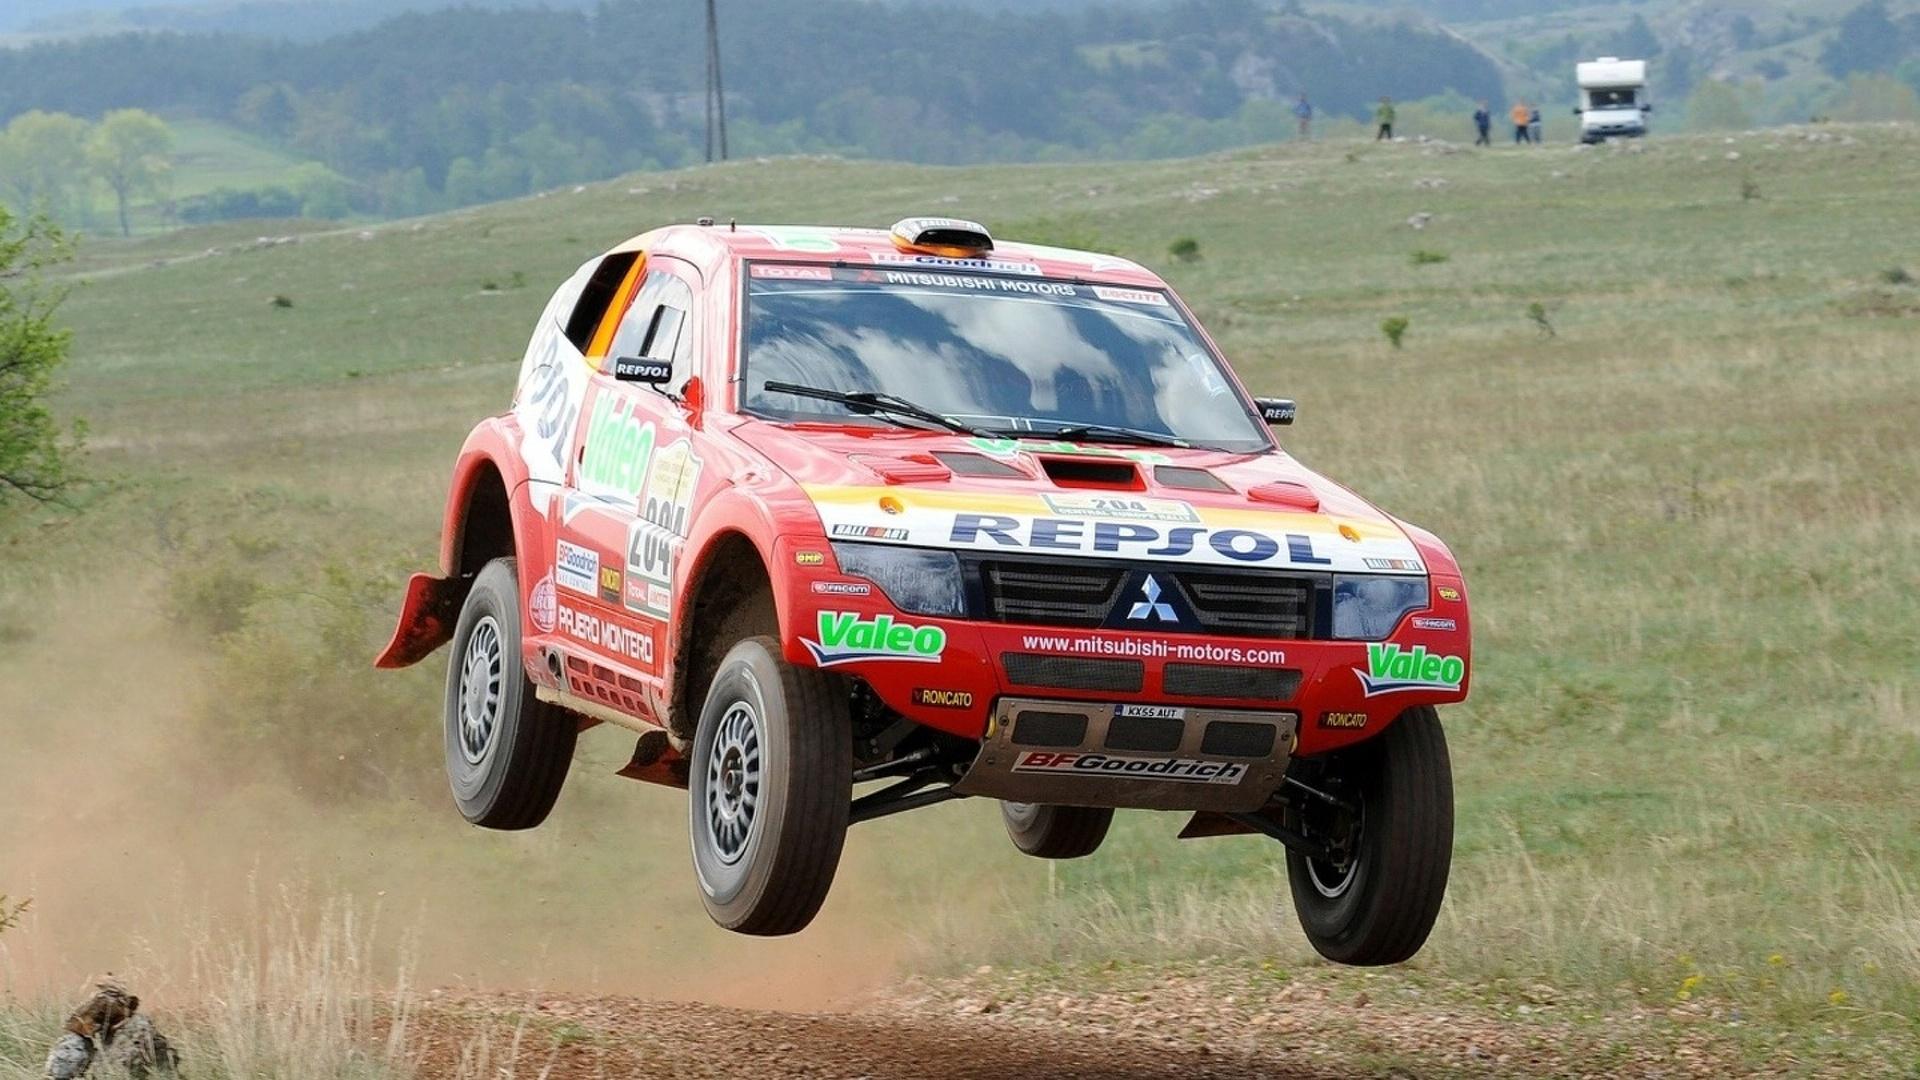 Mitsubishi Withdraws from Dakar Rally